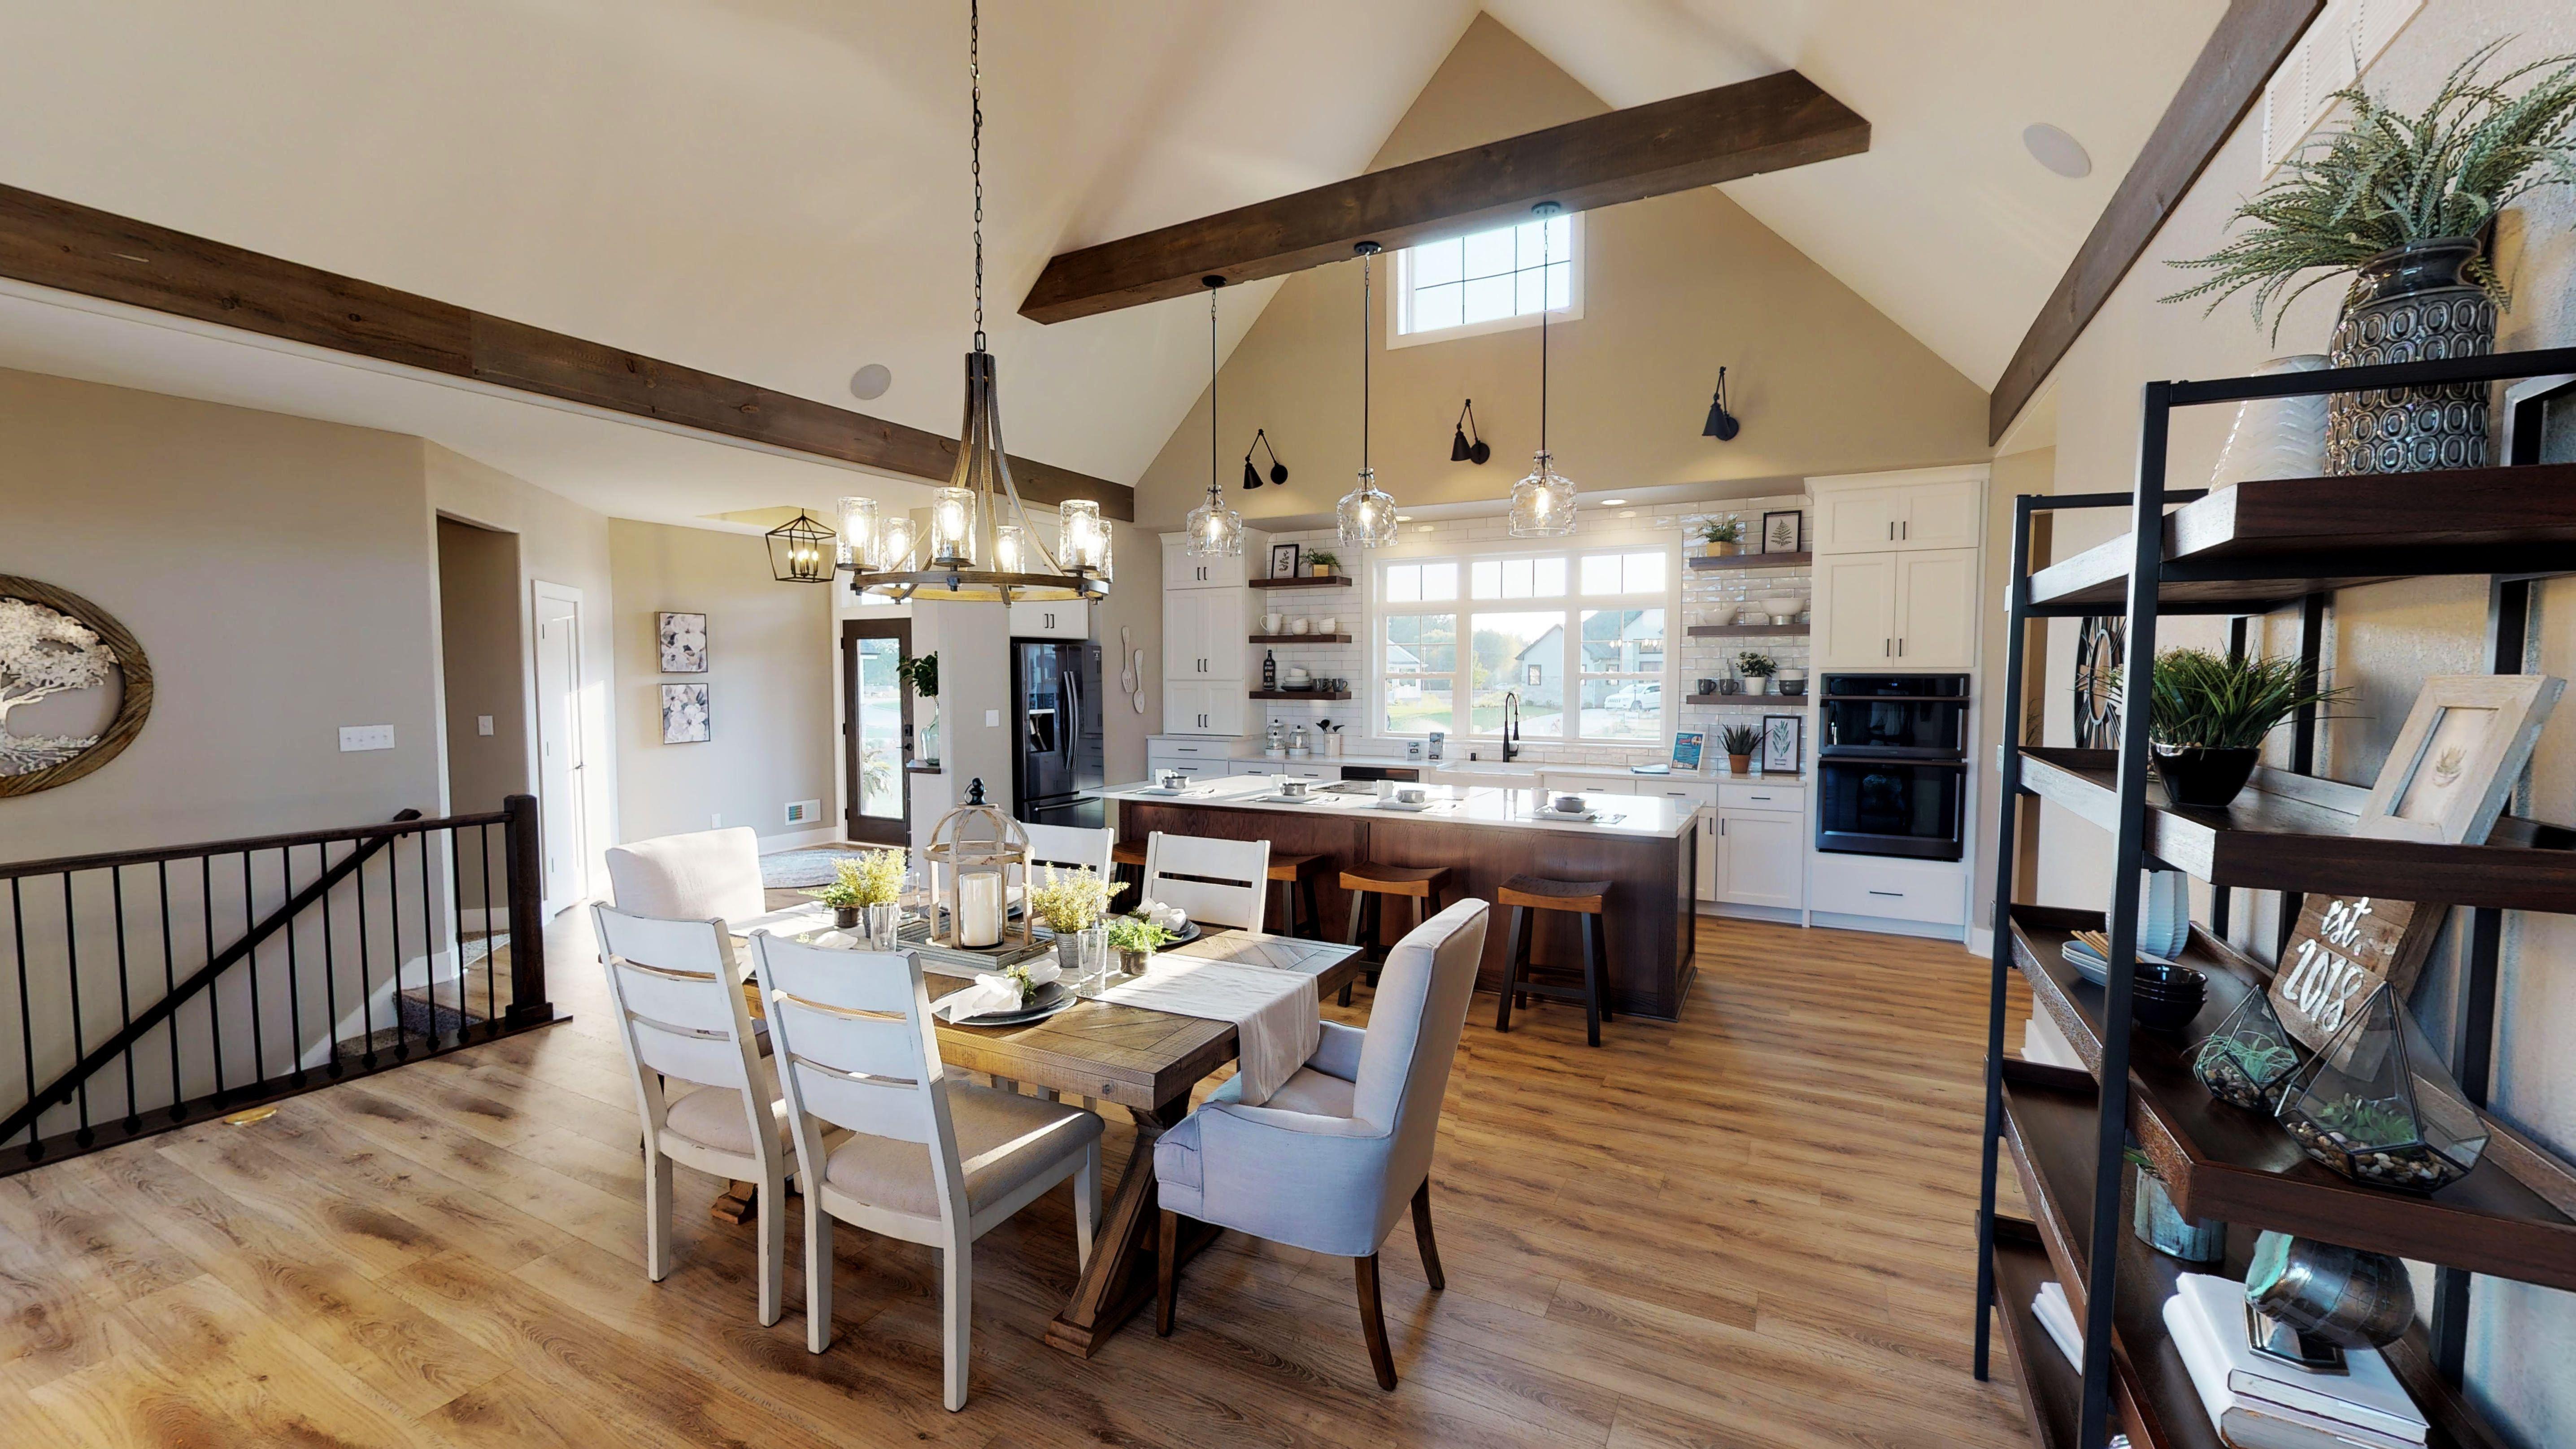 LVP Flooring Home, Parade of homes, Model homes